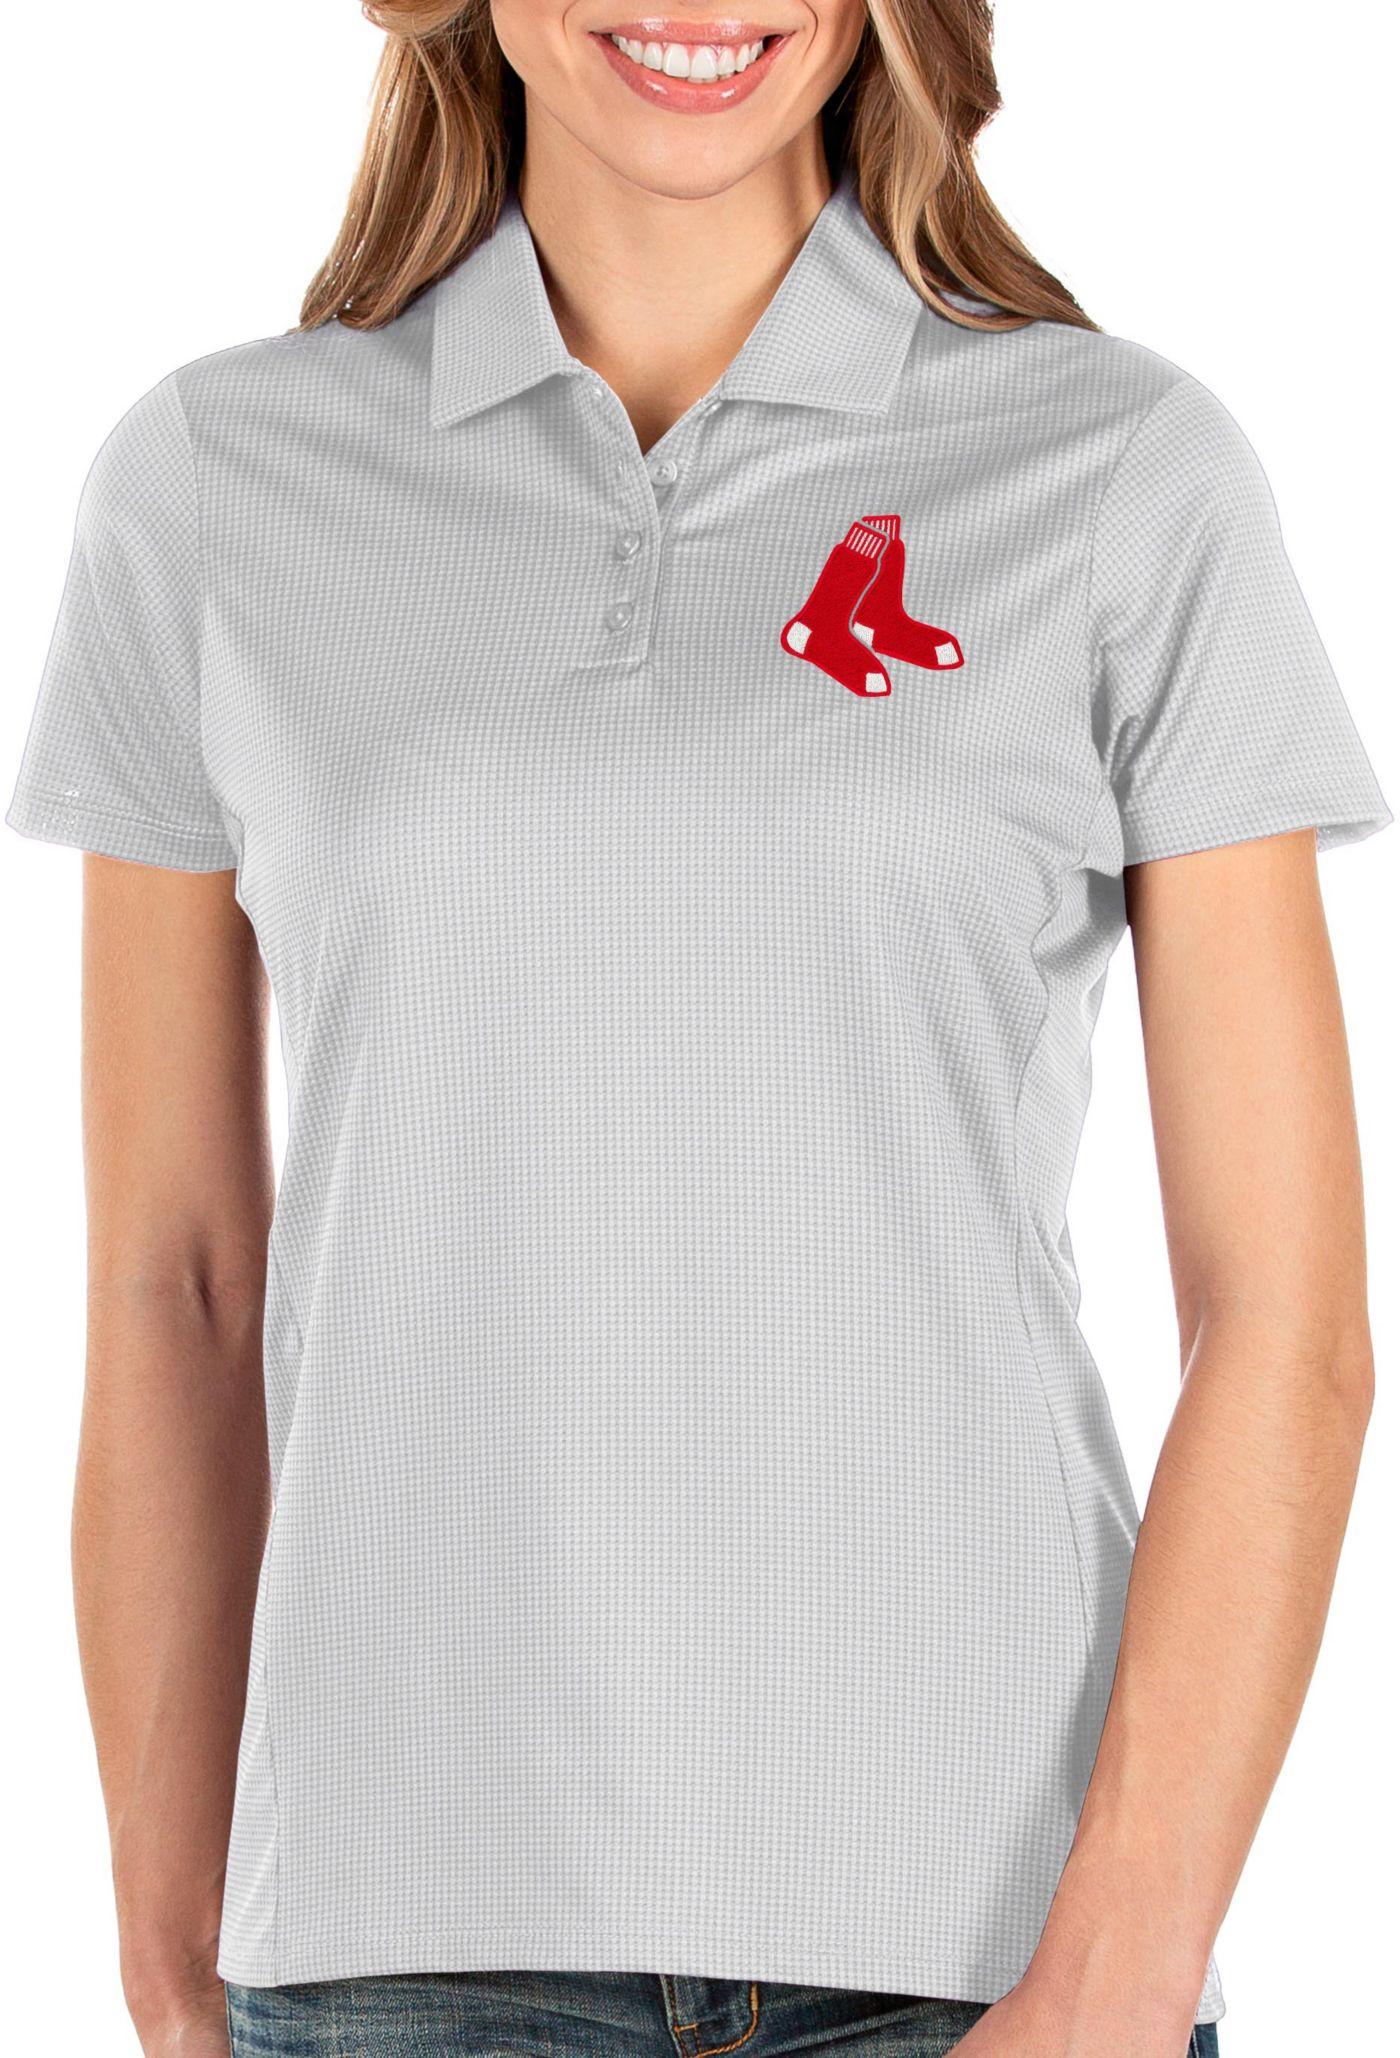 Antigua Women's Boston Red Sox White Balance Polo